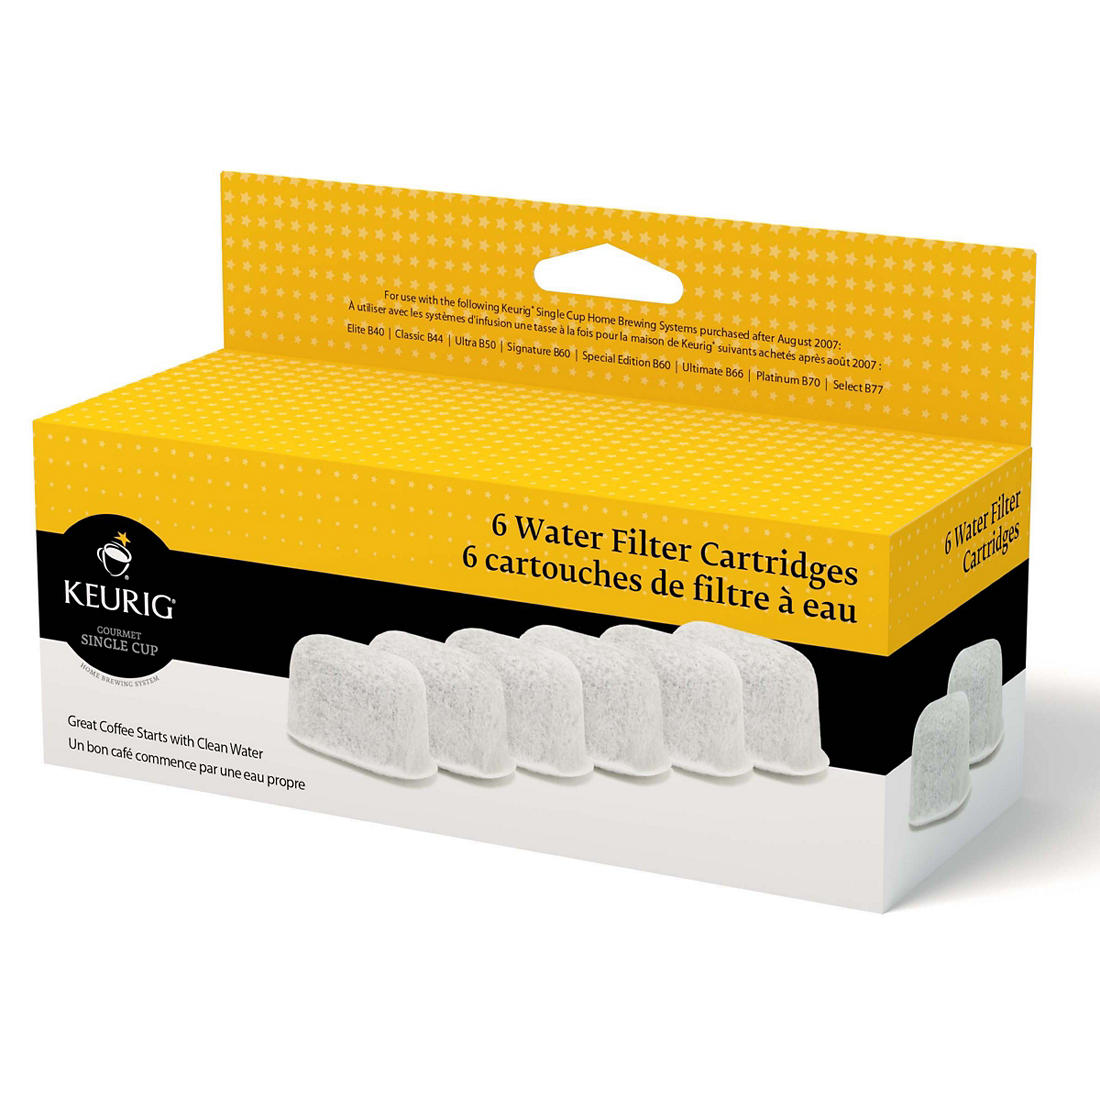 Keurig Water Filter Cartridges, 6 pk